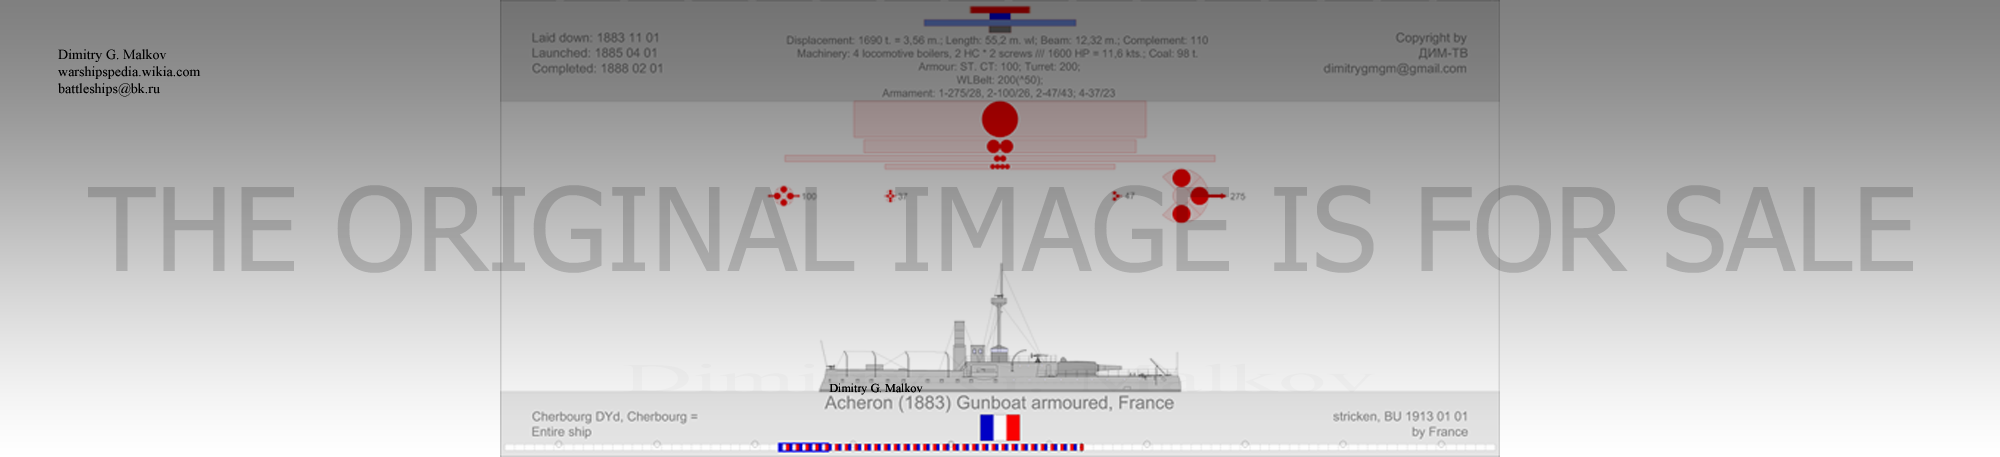 Mes dessins des navires francais - Page 9 Ga-18813